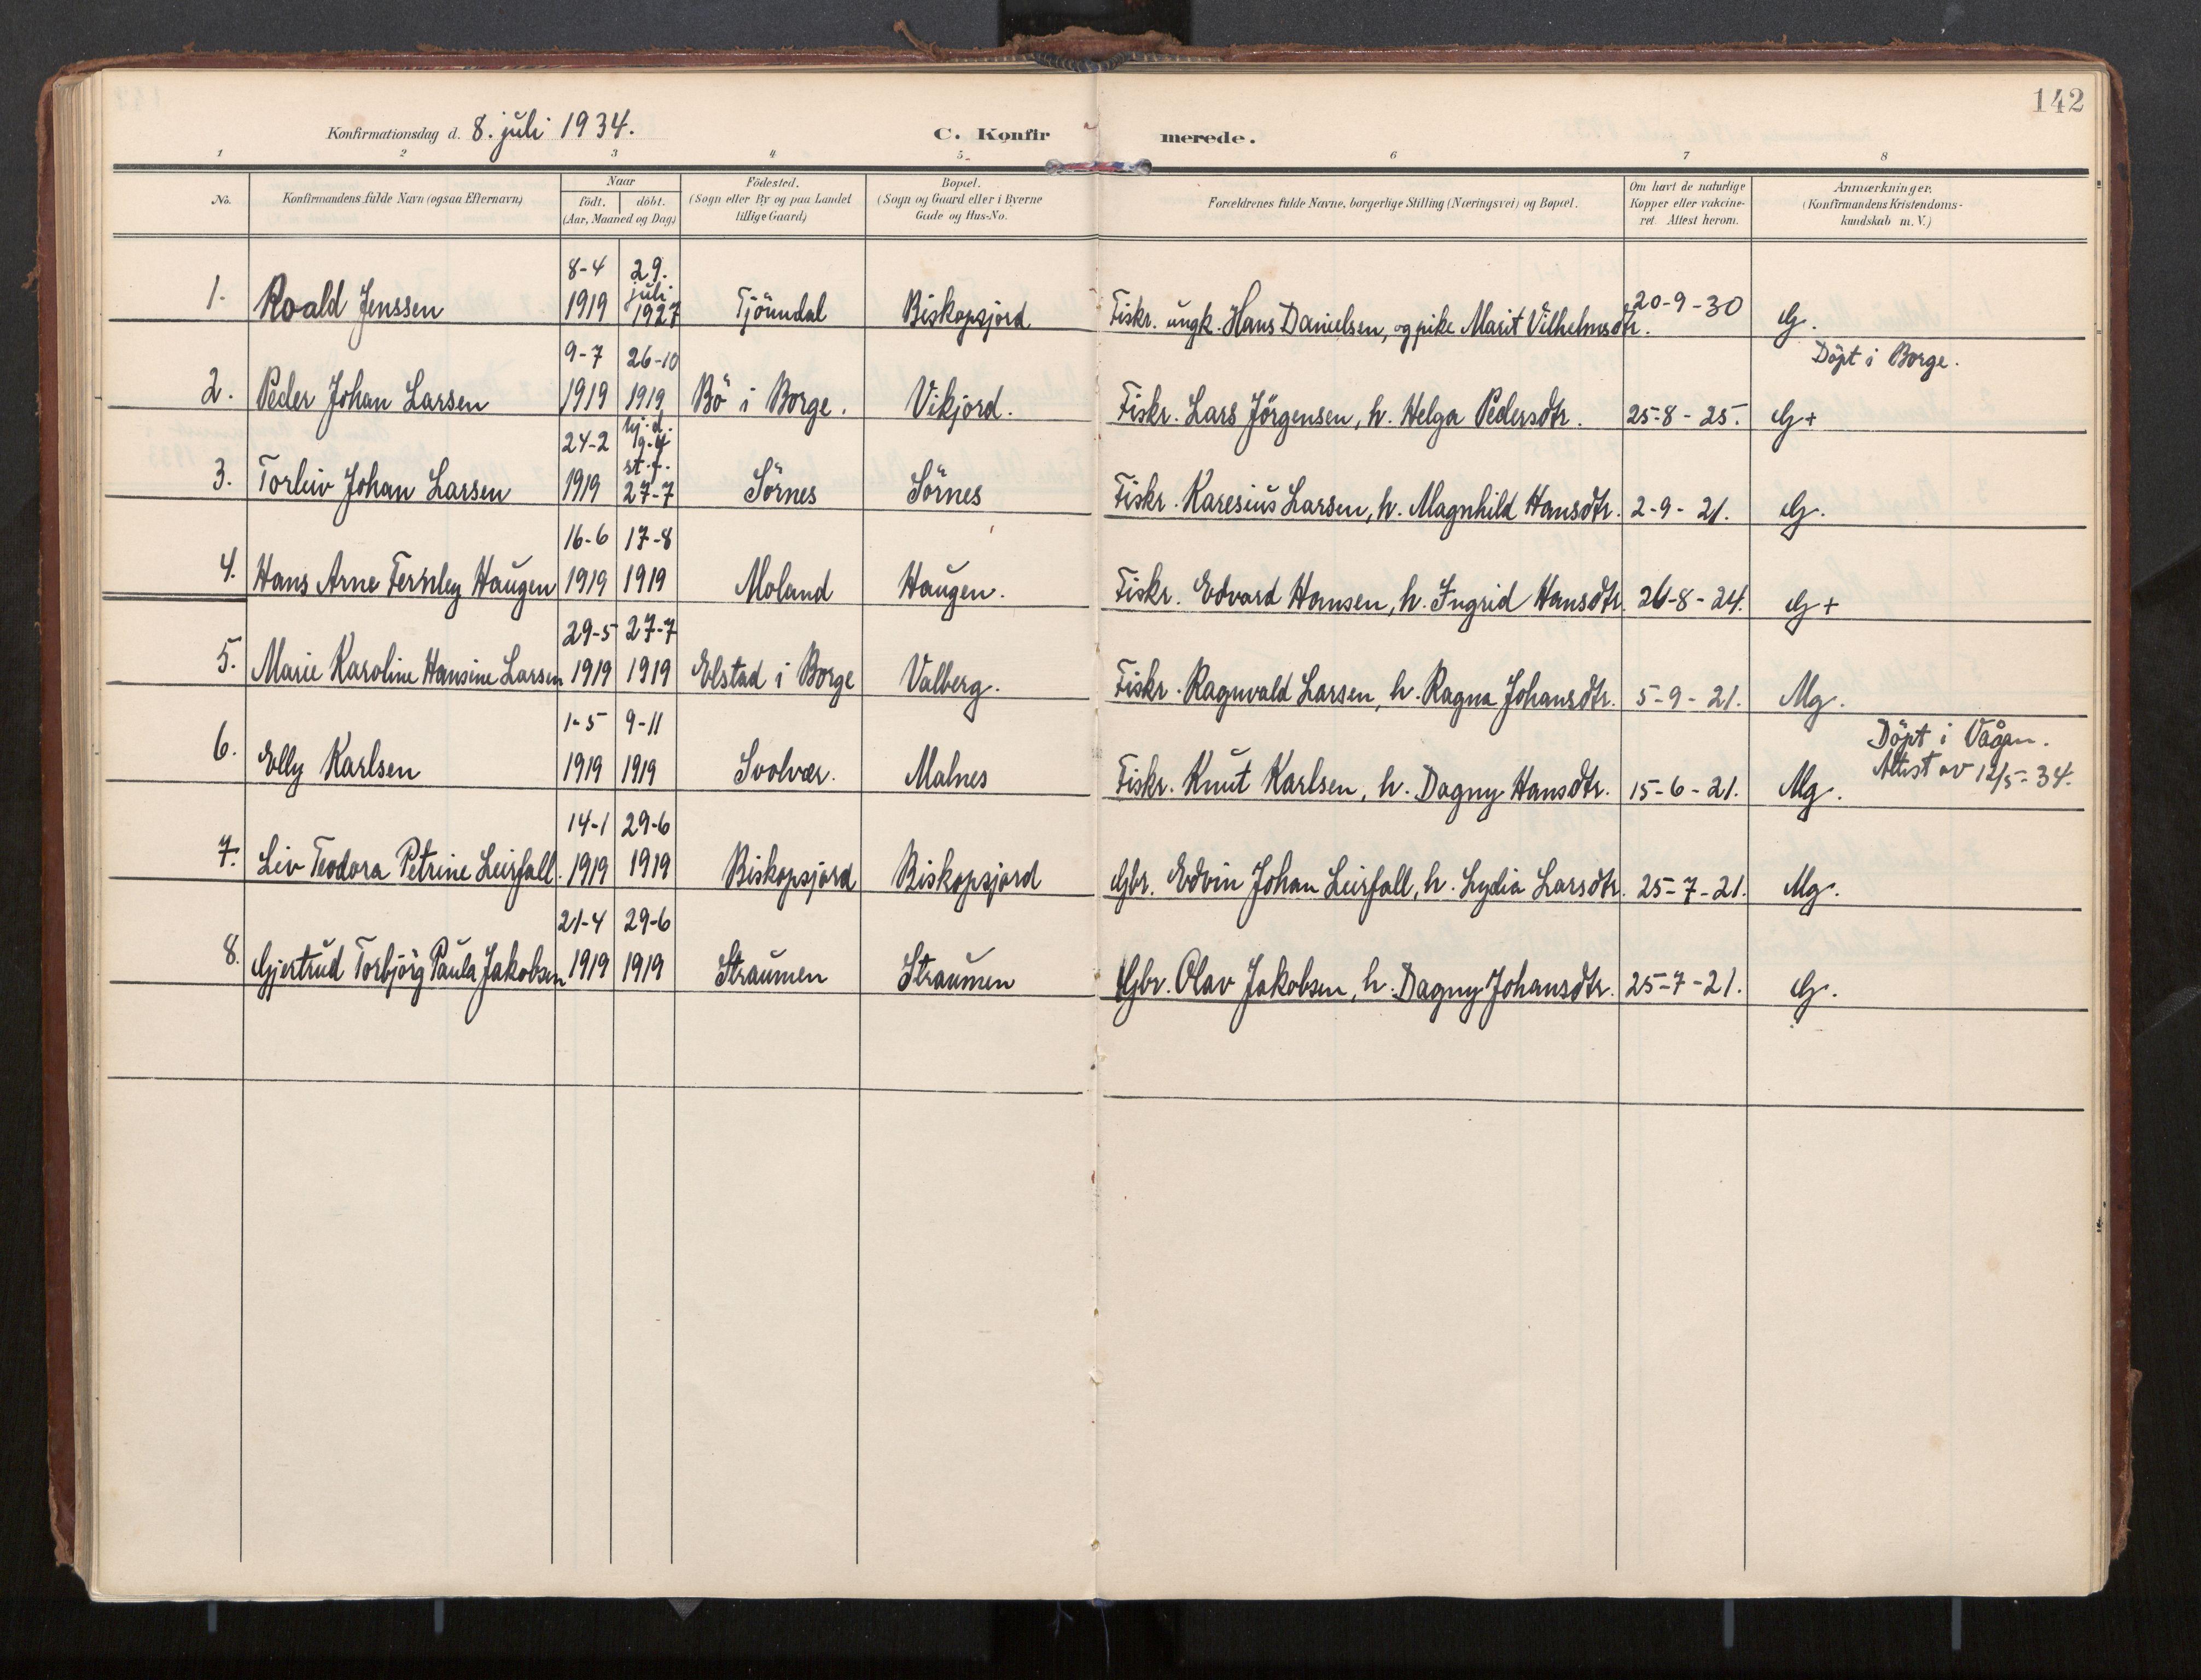 SAT, Ministerialprotokoller, klokkerbøker og fødselsregistre - Nordland, 884/L1194: Ministerialbok nr. 884A02, 1906-1937, s. 142